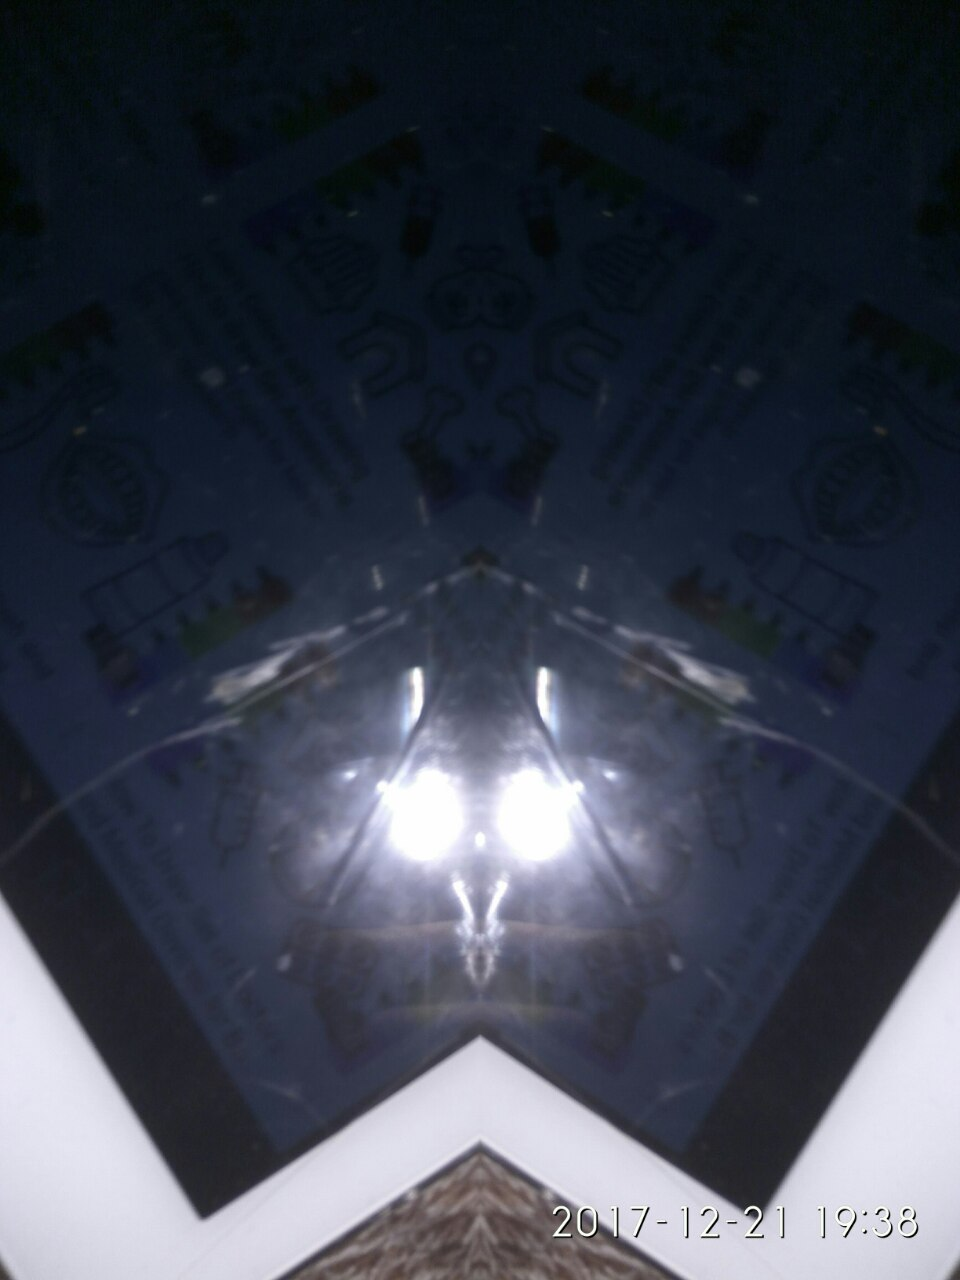 image-0-02-05-52082c85a44d0cb5311b0ae3588eb93206539a703fe0f646c6b8ea17796d2b0d-V.jpg